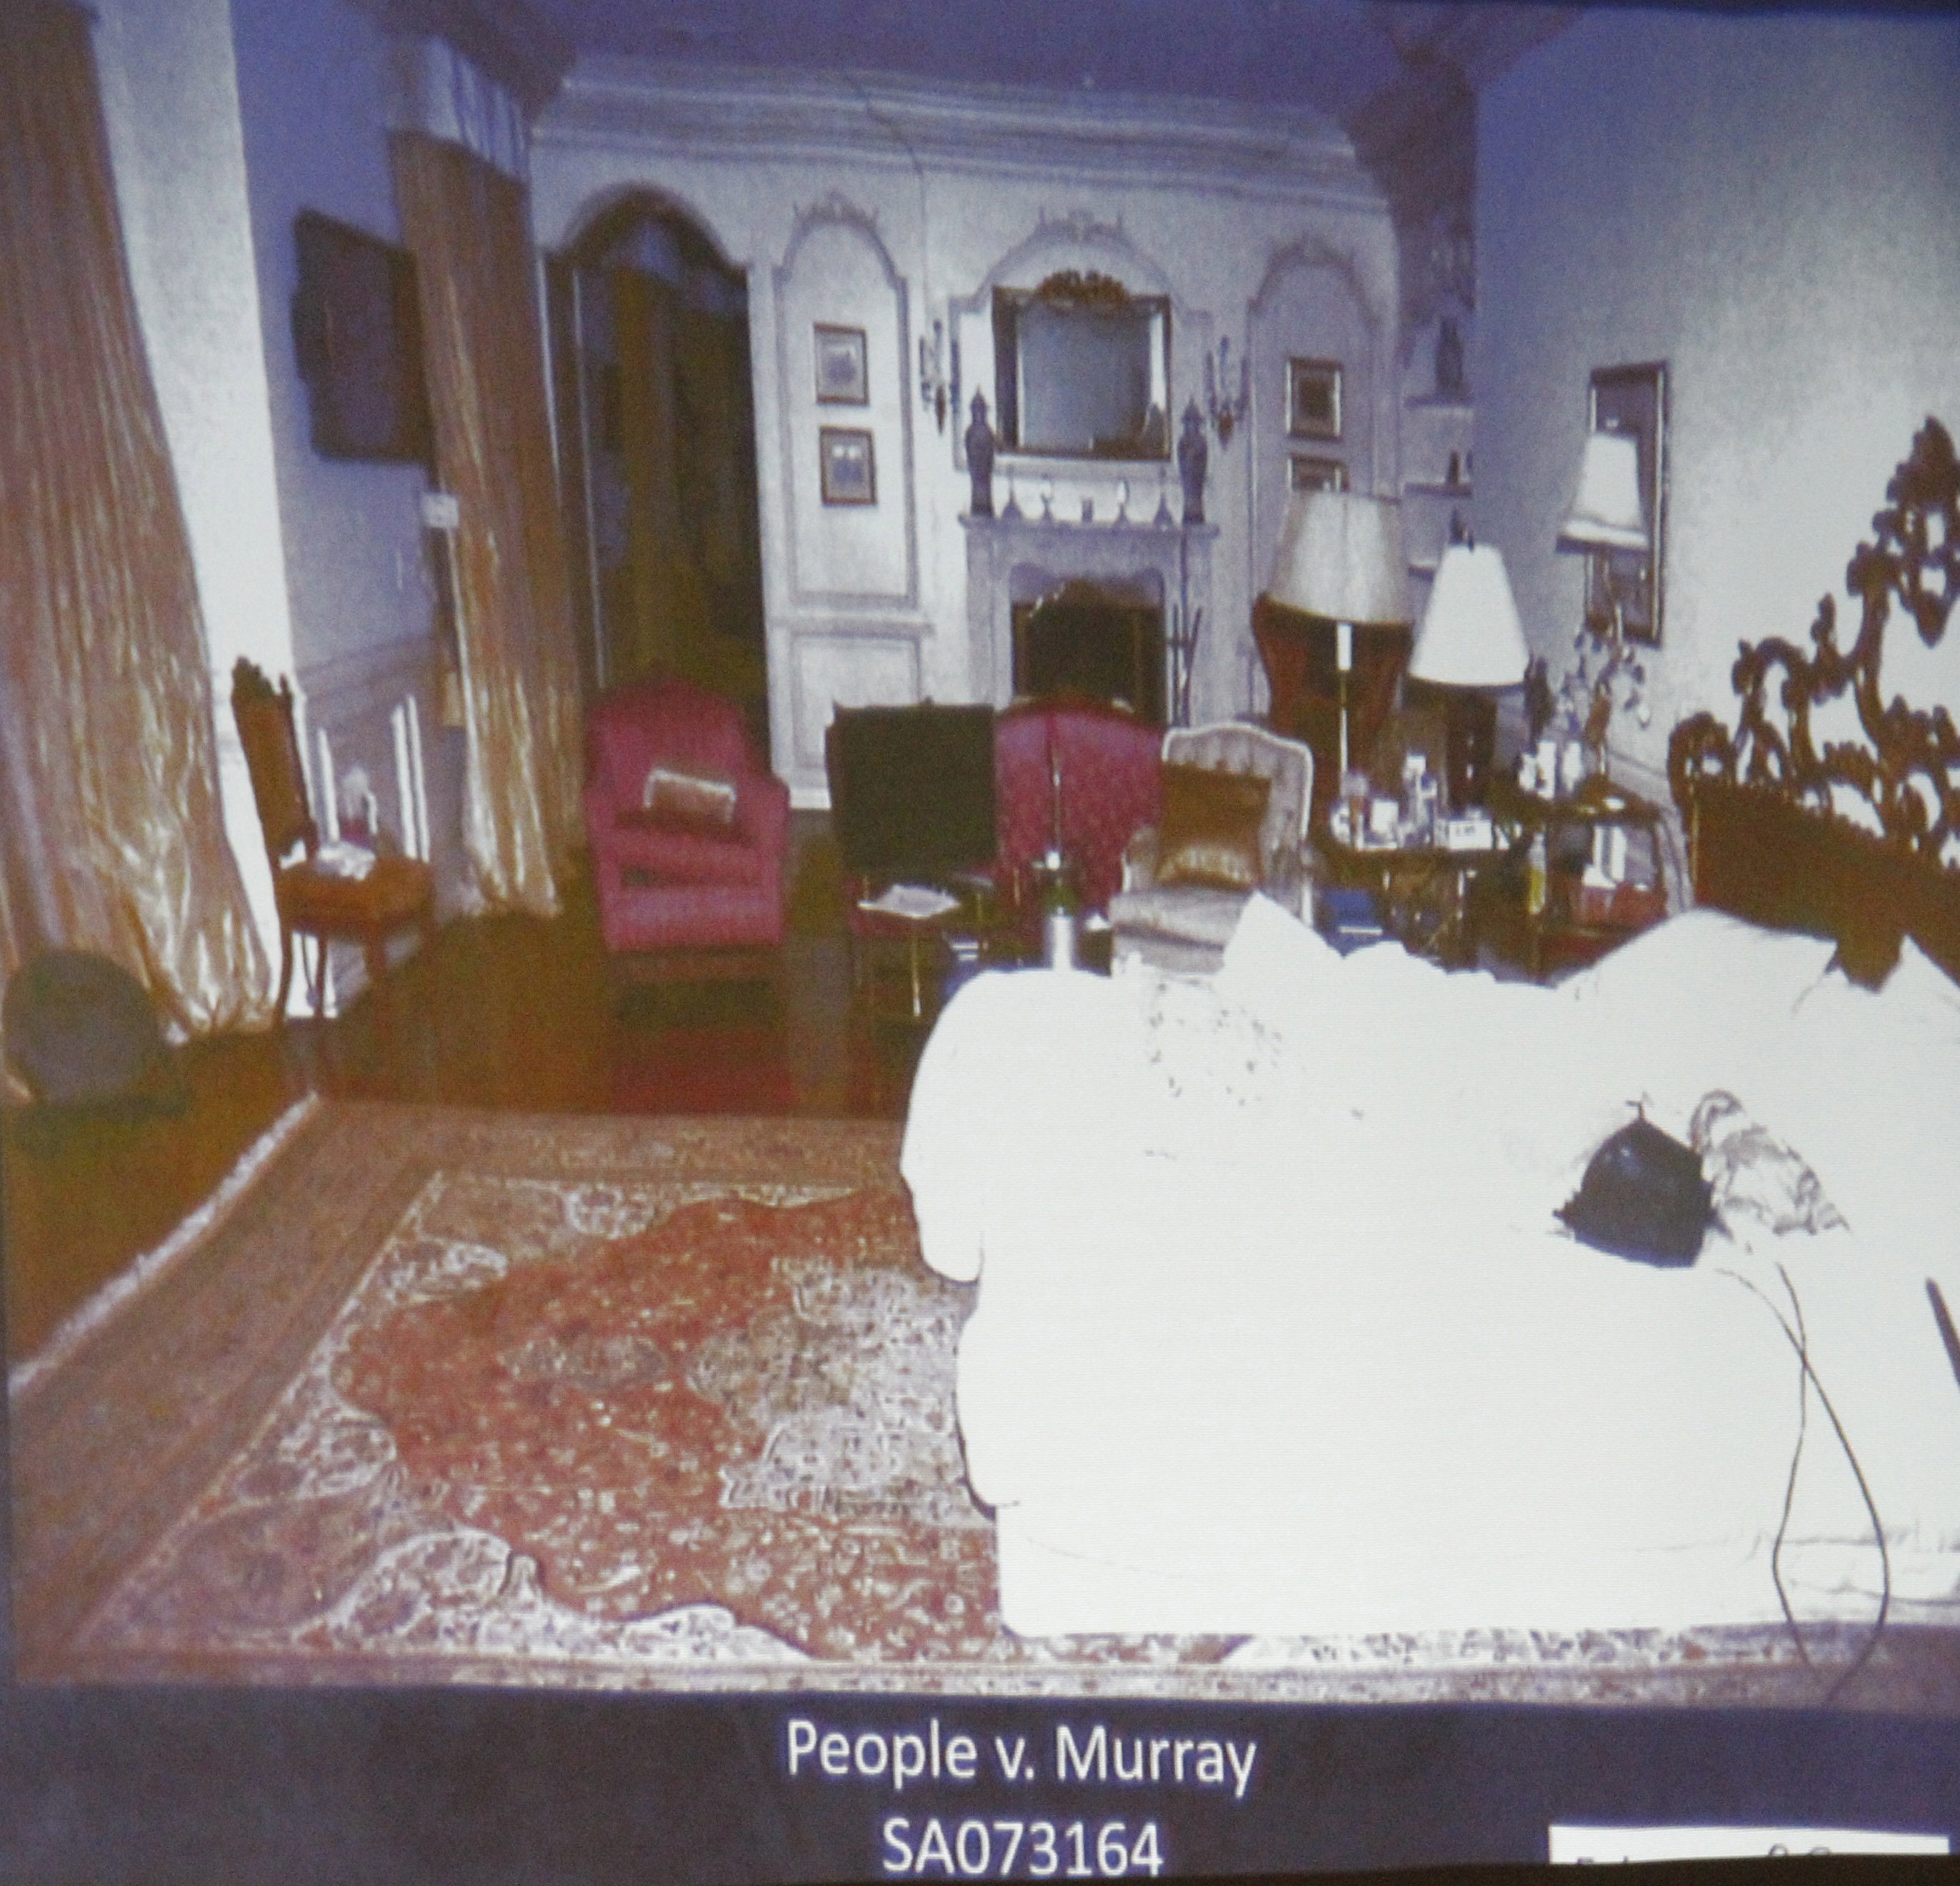 Michael Jackson Wallpaper For Bedroom Doctor Took Medical Vials From Jacksons Nightstand Before 911